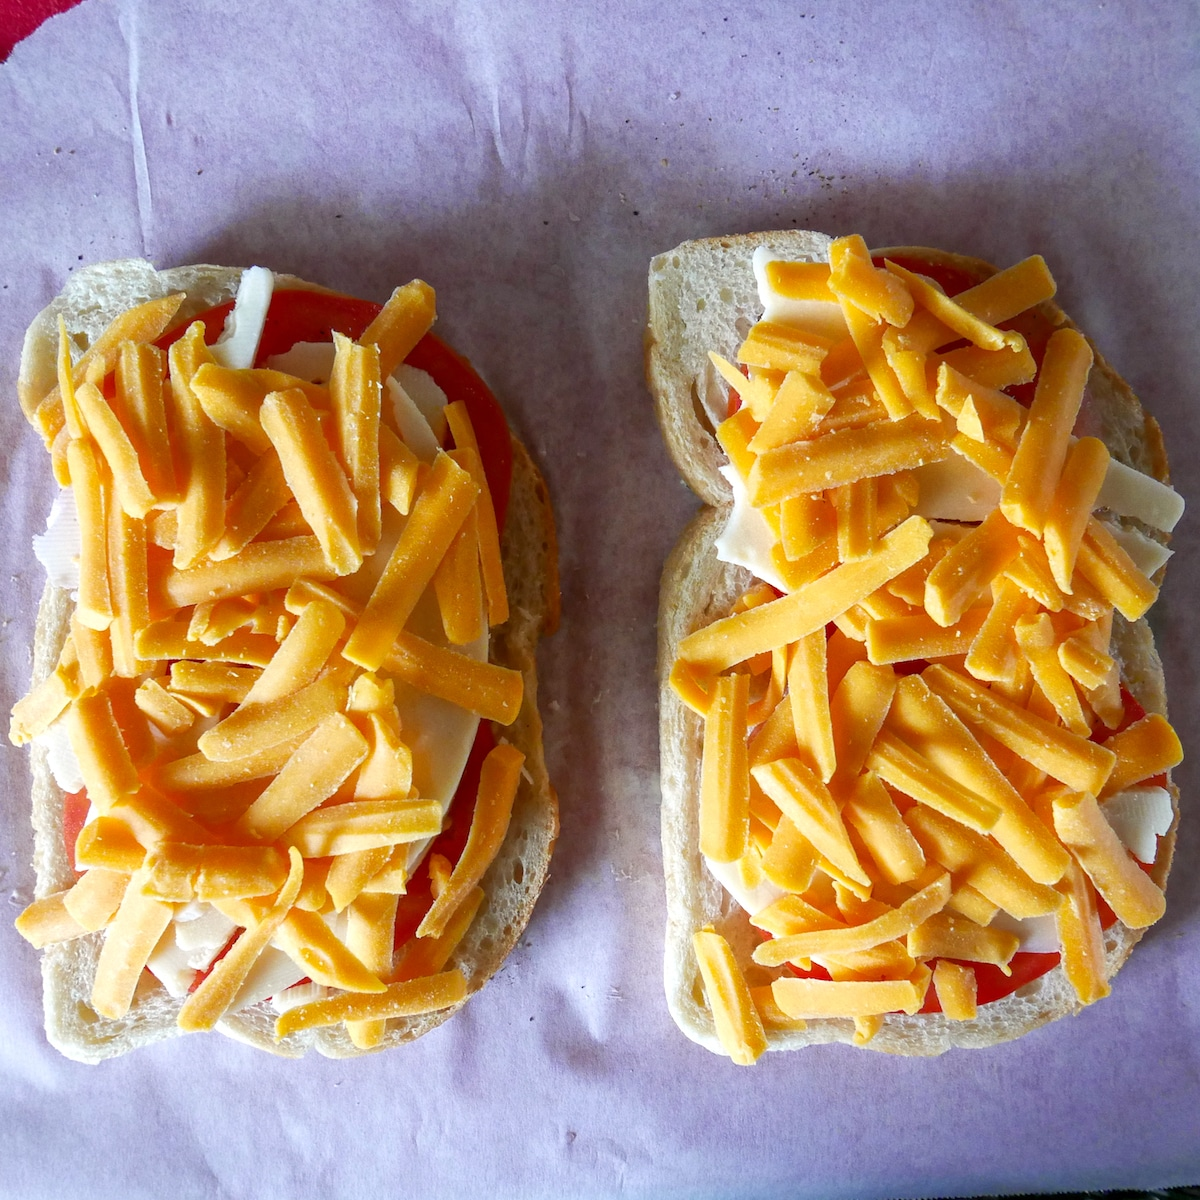 cheddar cheese on sourdough